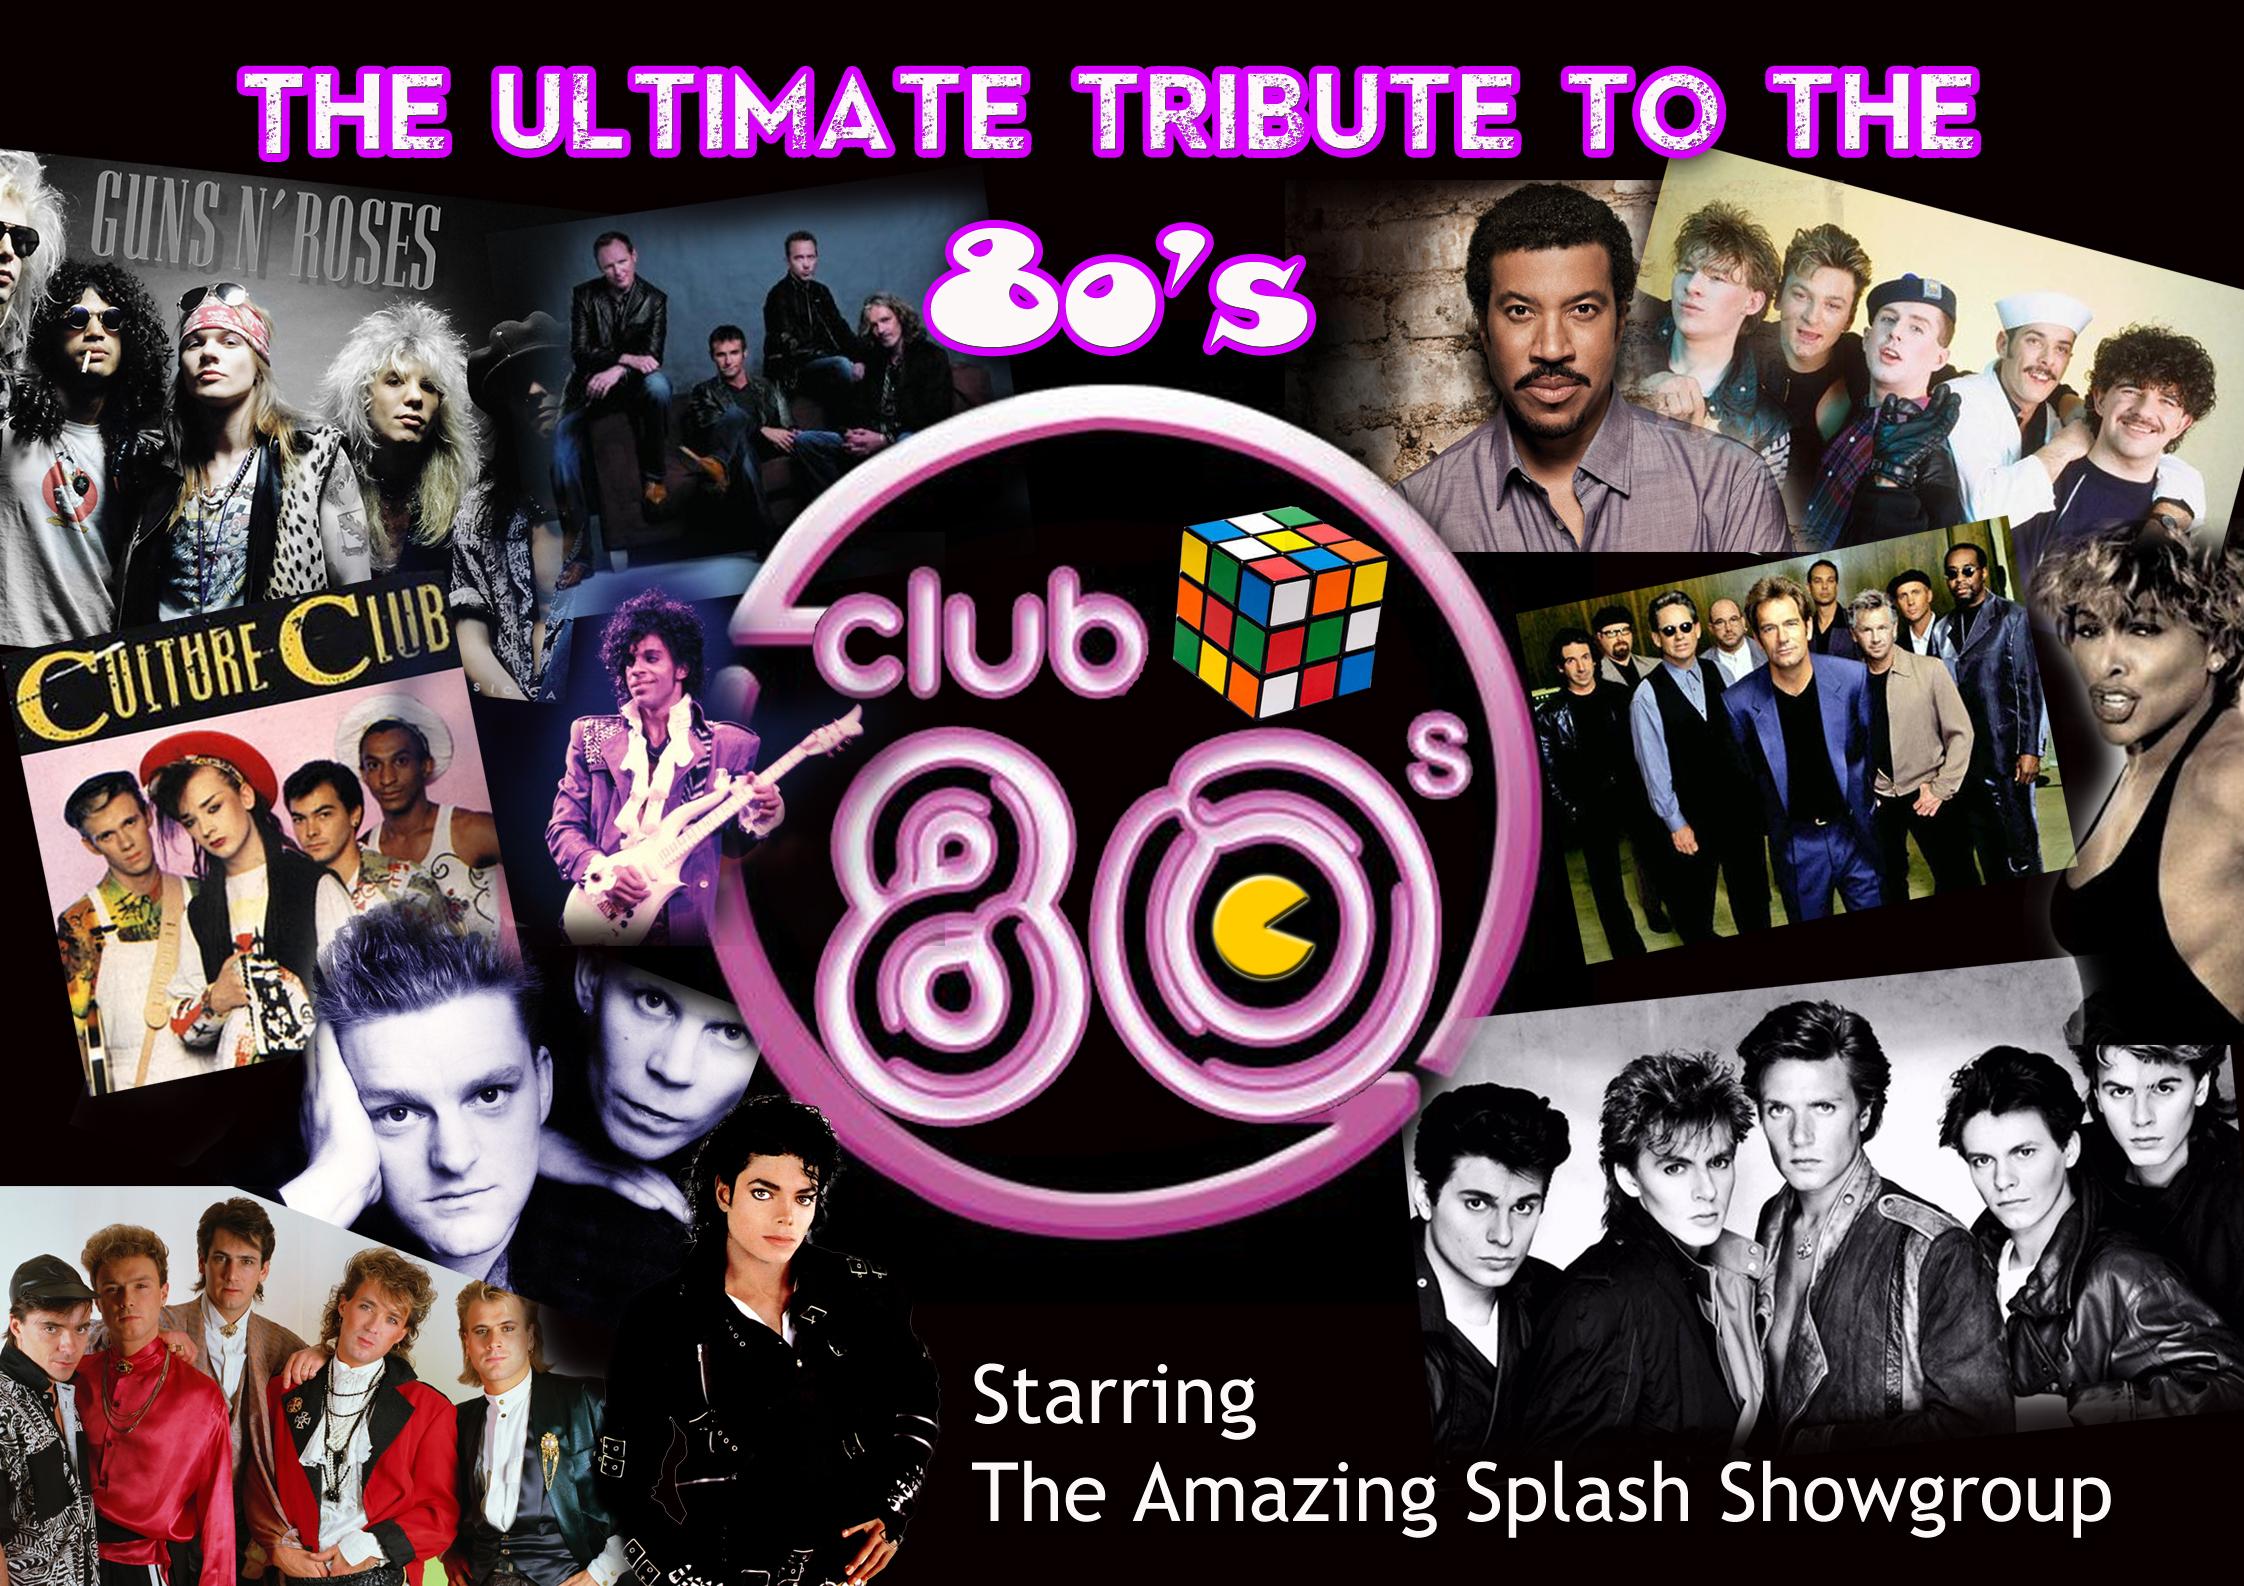 Club 80s Poster web